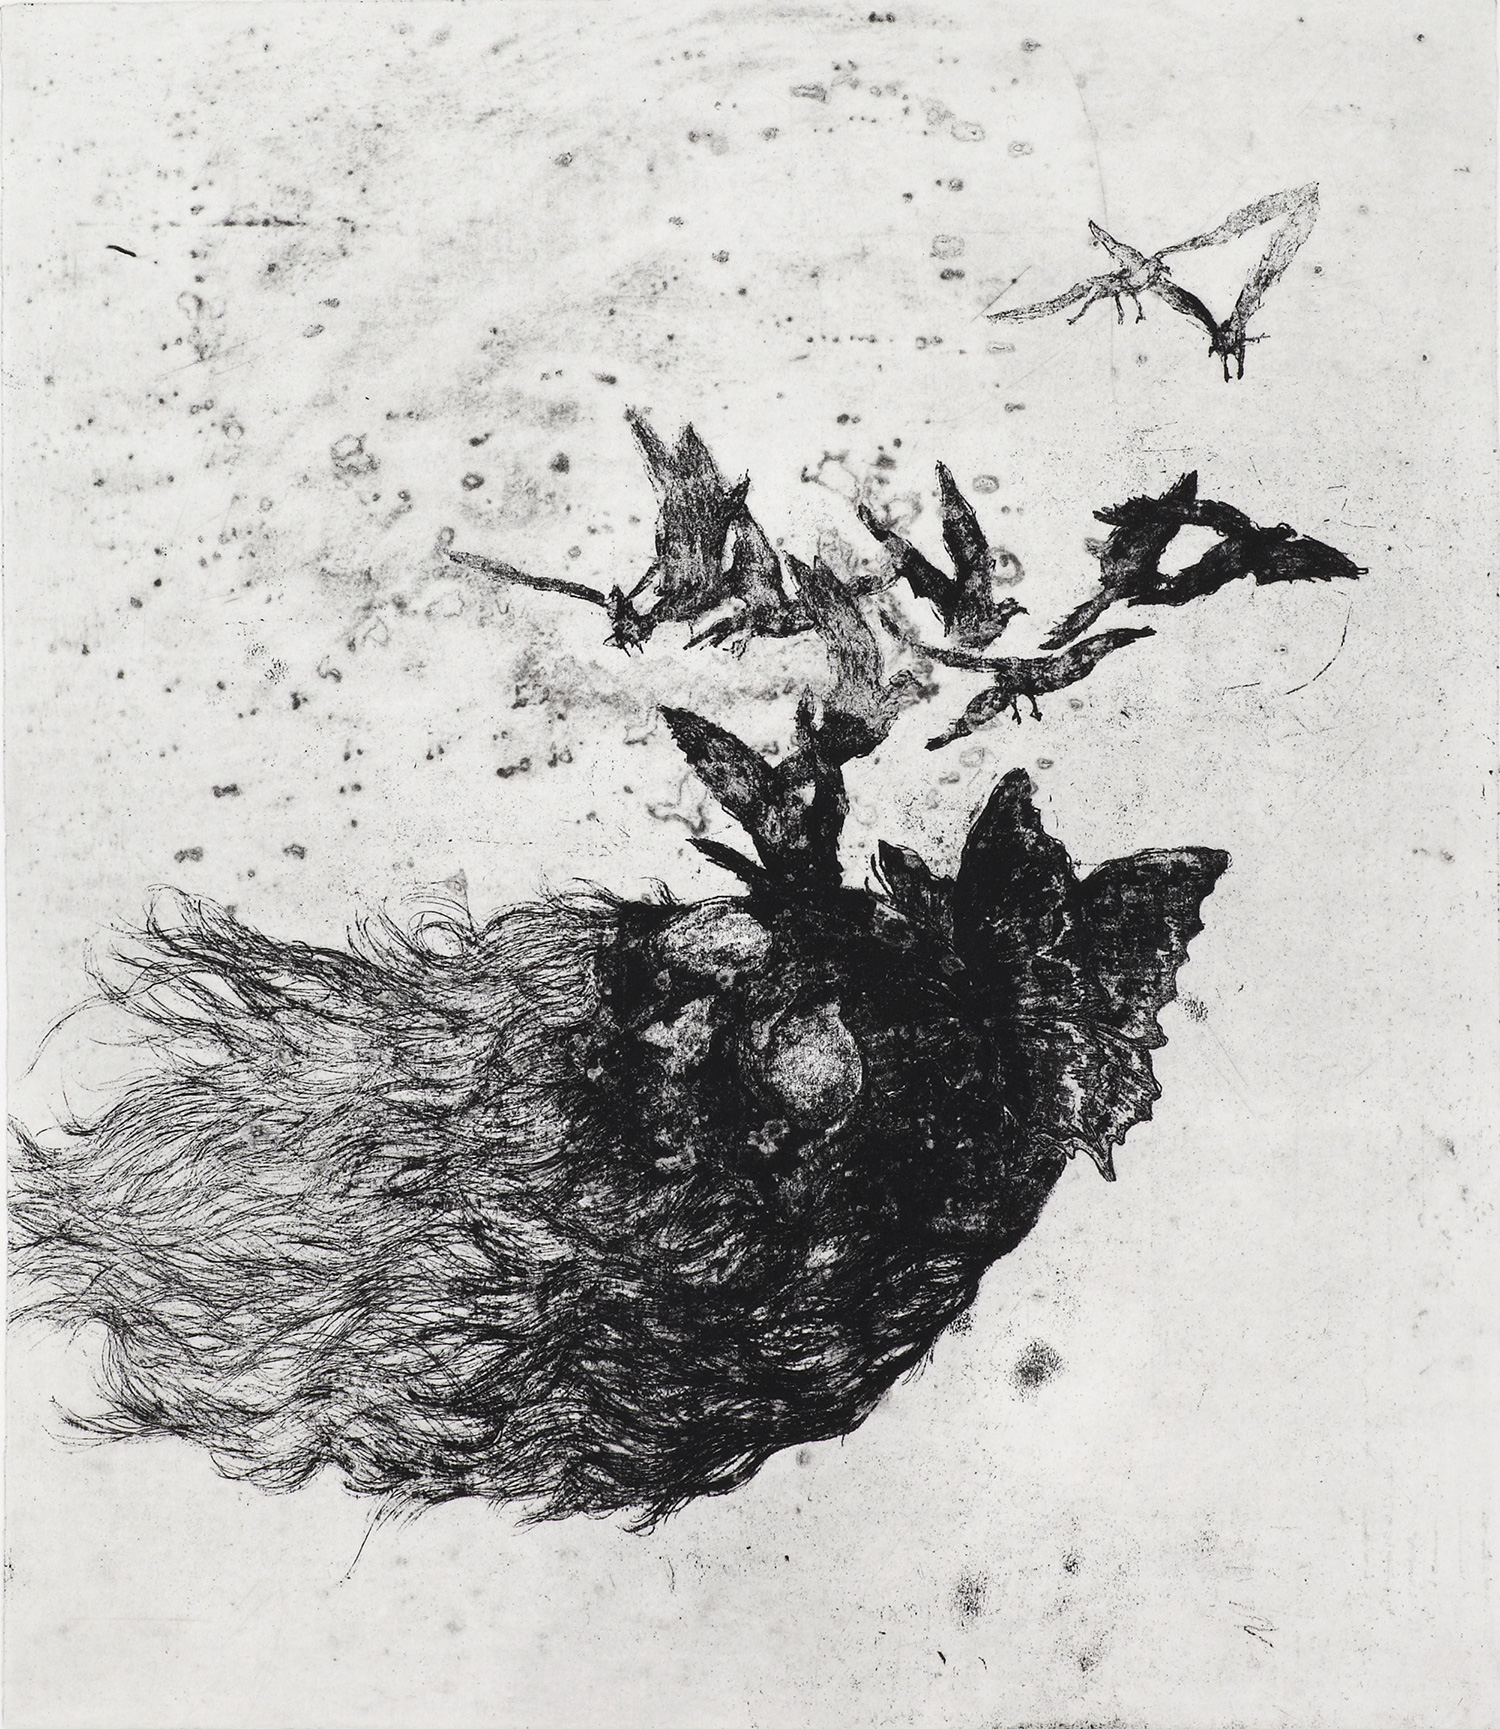 <i>nature chamane</i>, 2011, vernis mou et pointe sèche, 75x63cm